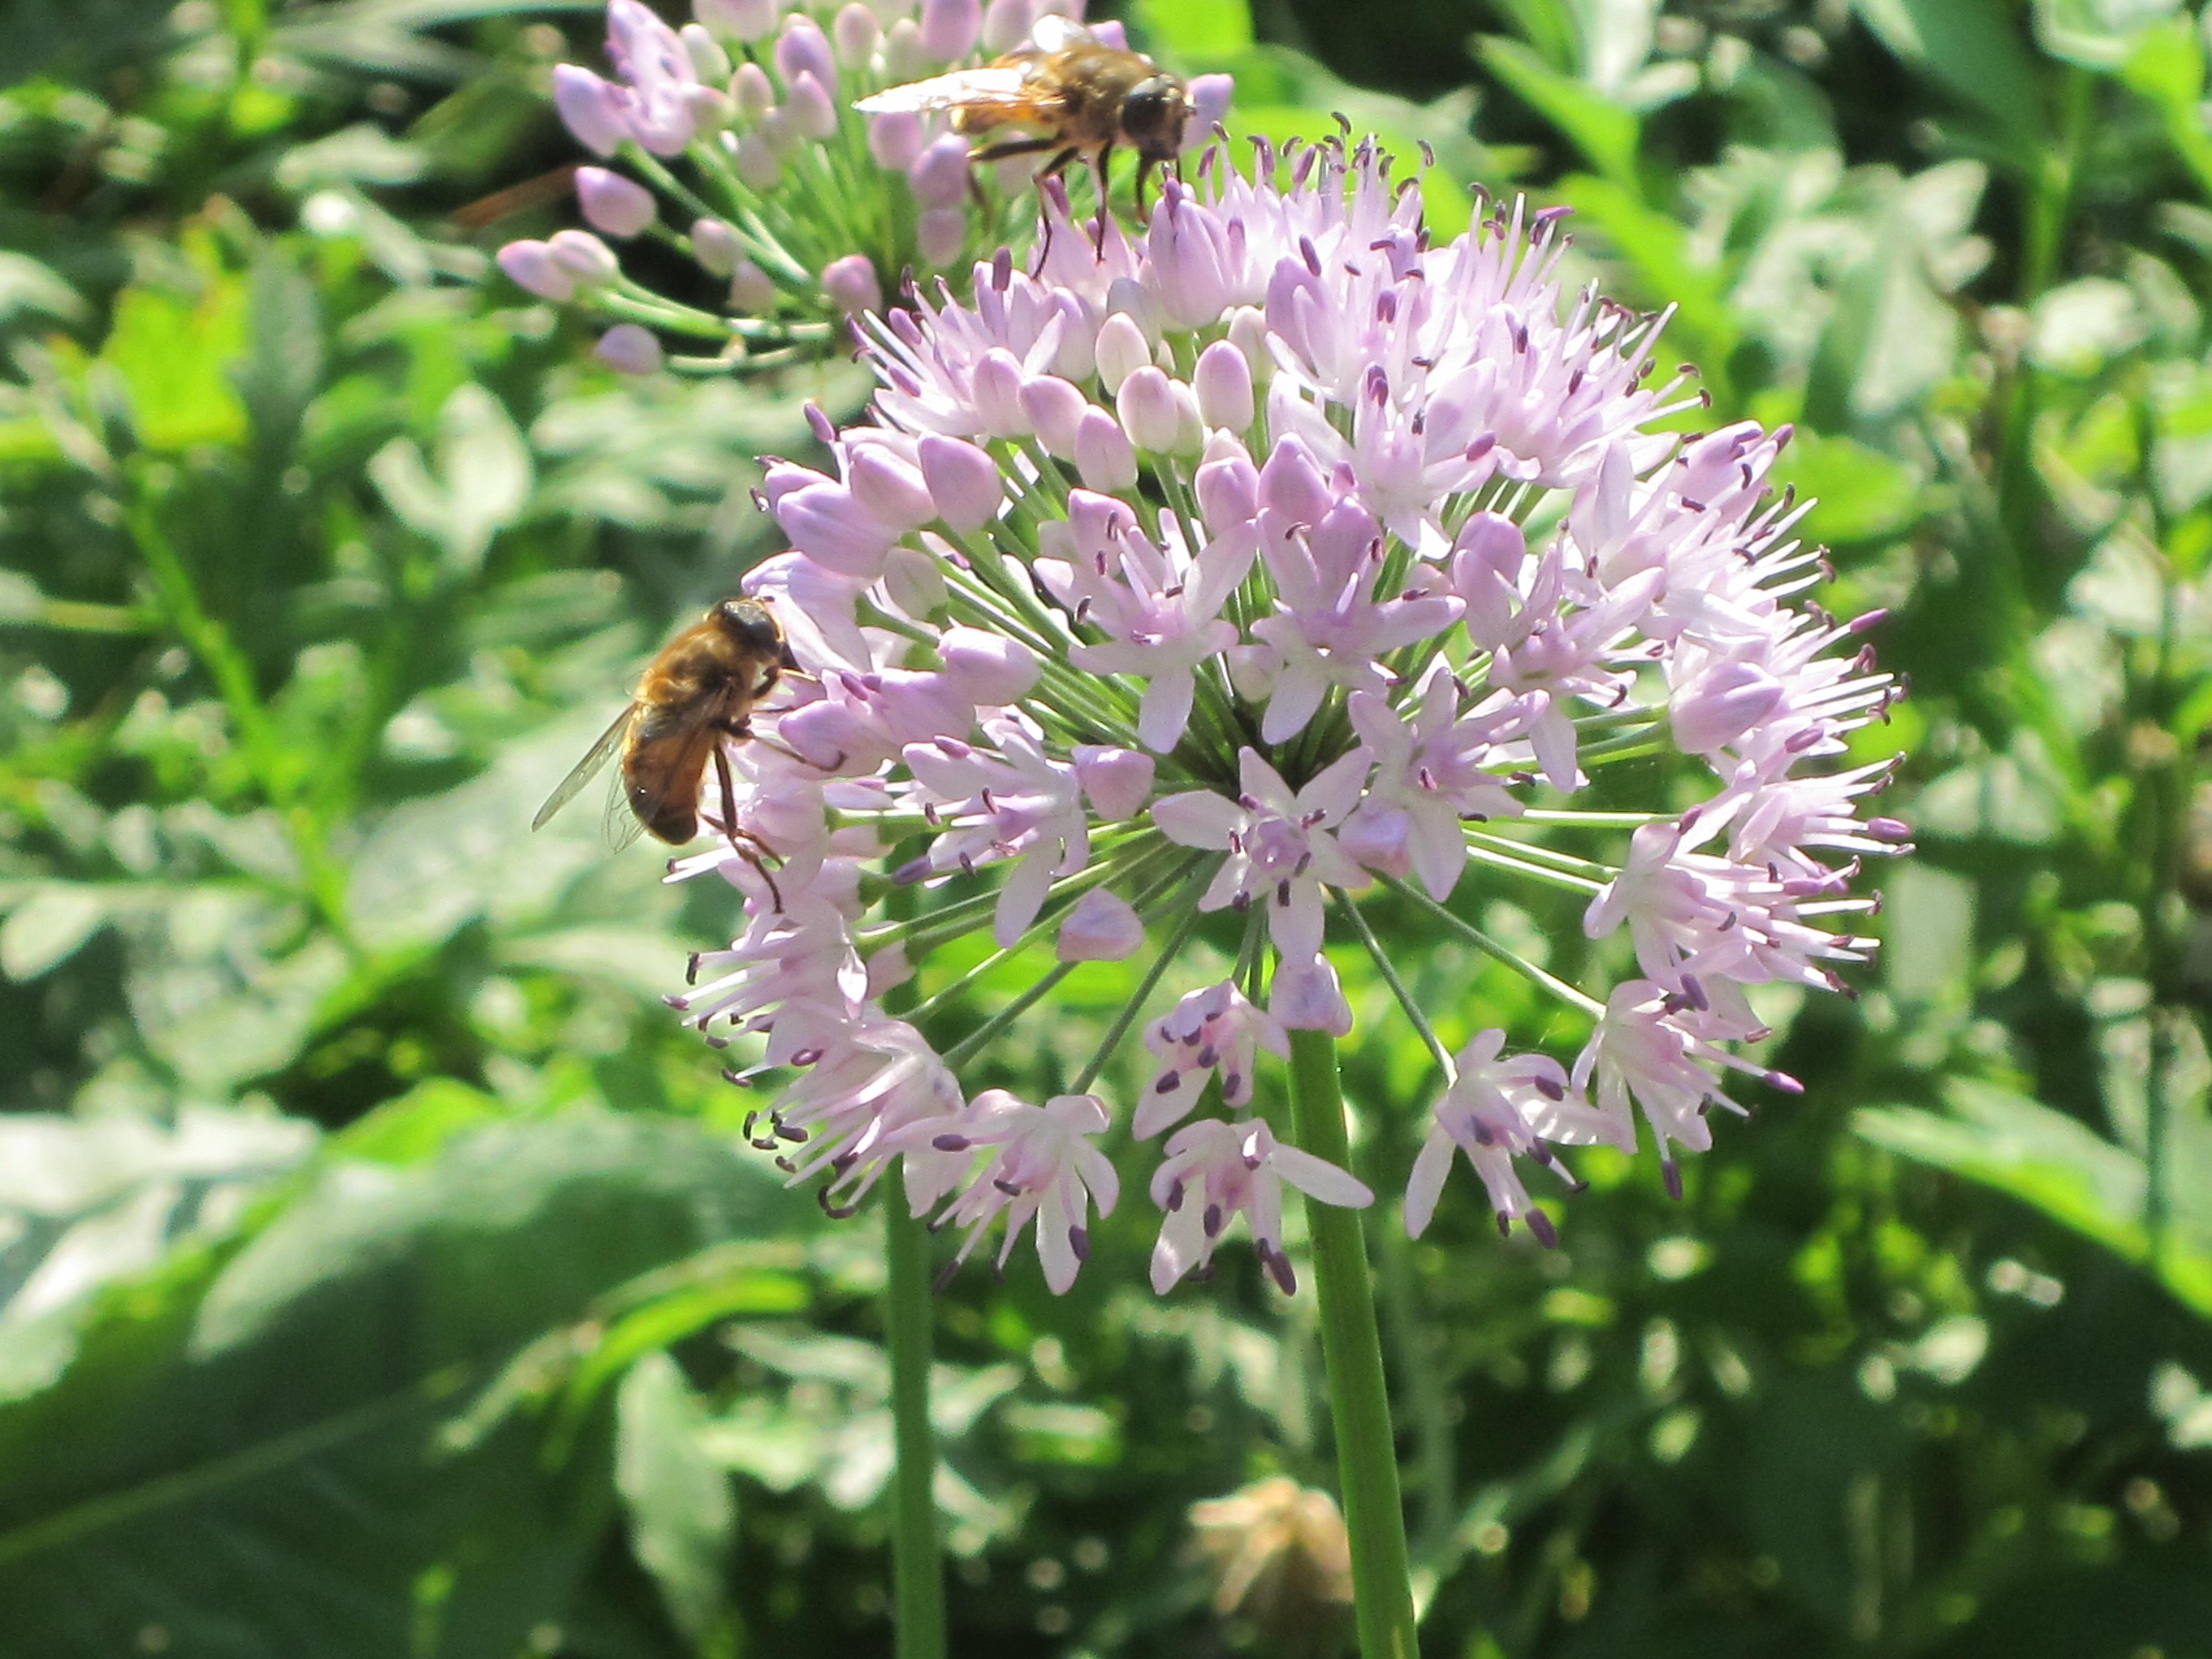 Neonic-free garden plants